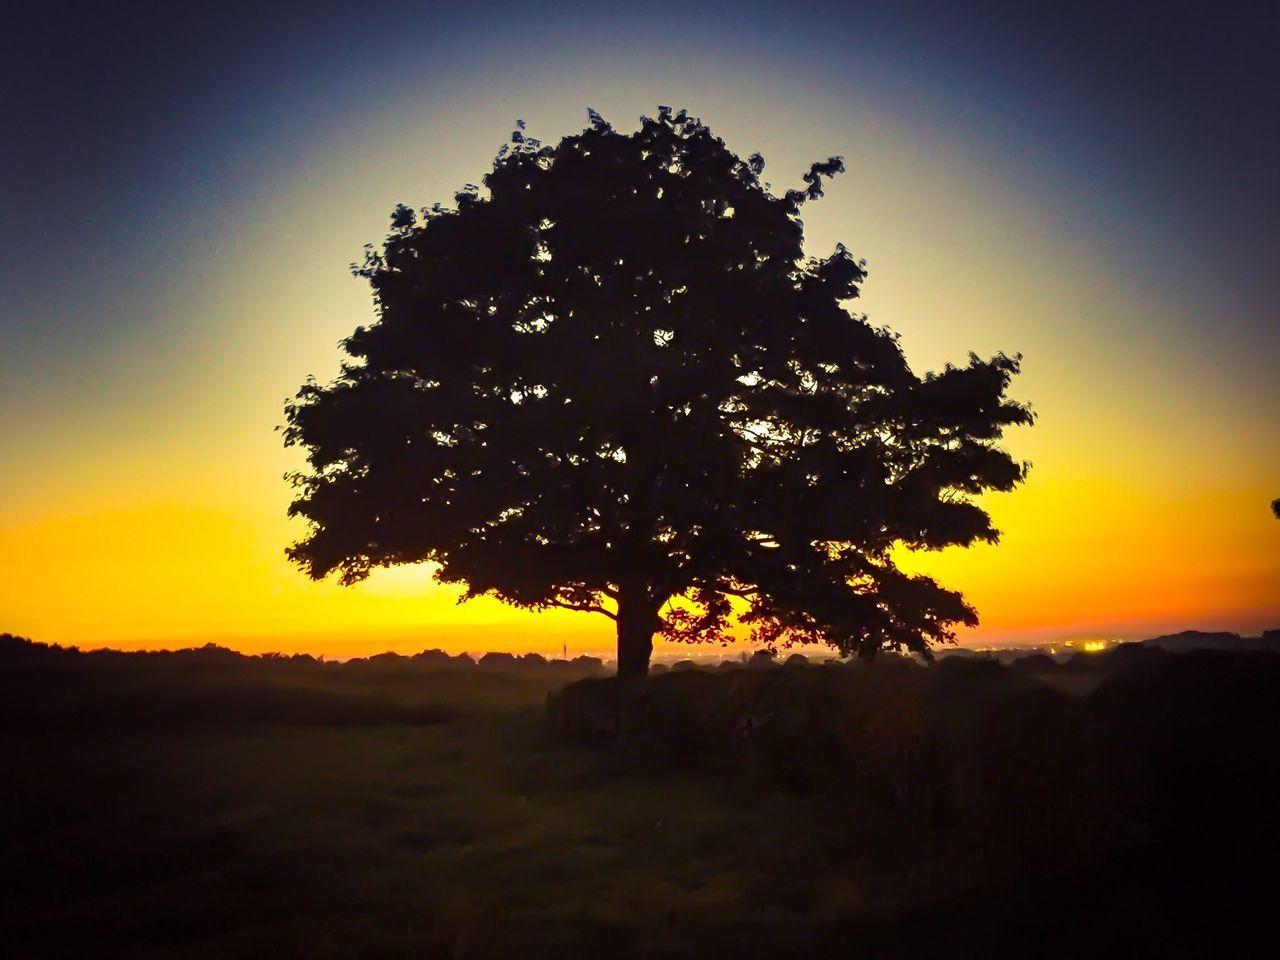 Trees Sunset Sunset Silhouettes Sunset_collection Skyline